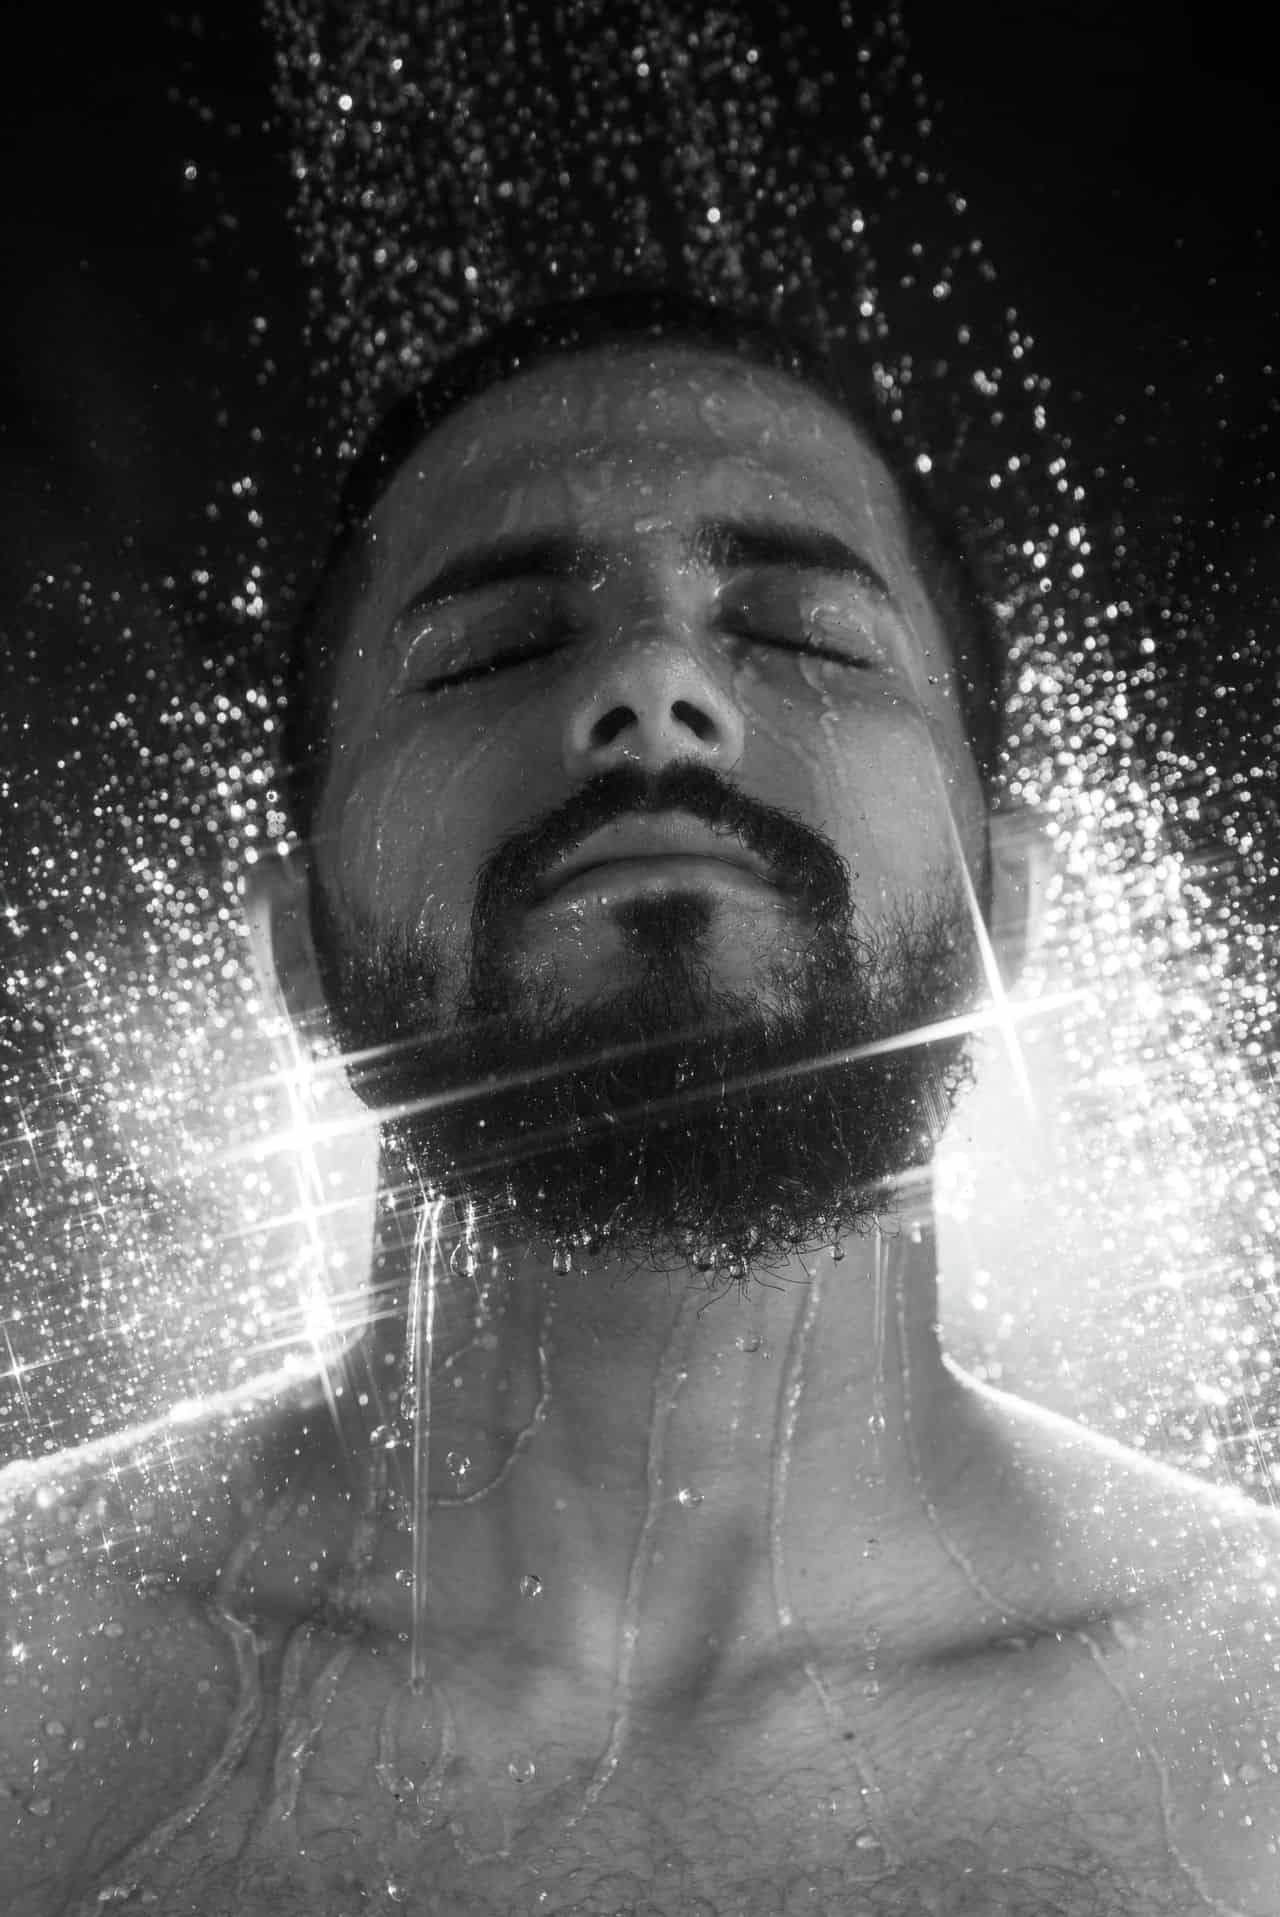 man cold shower